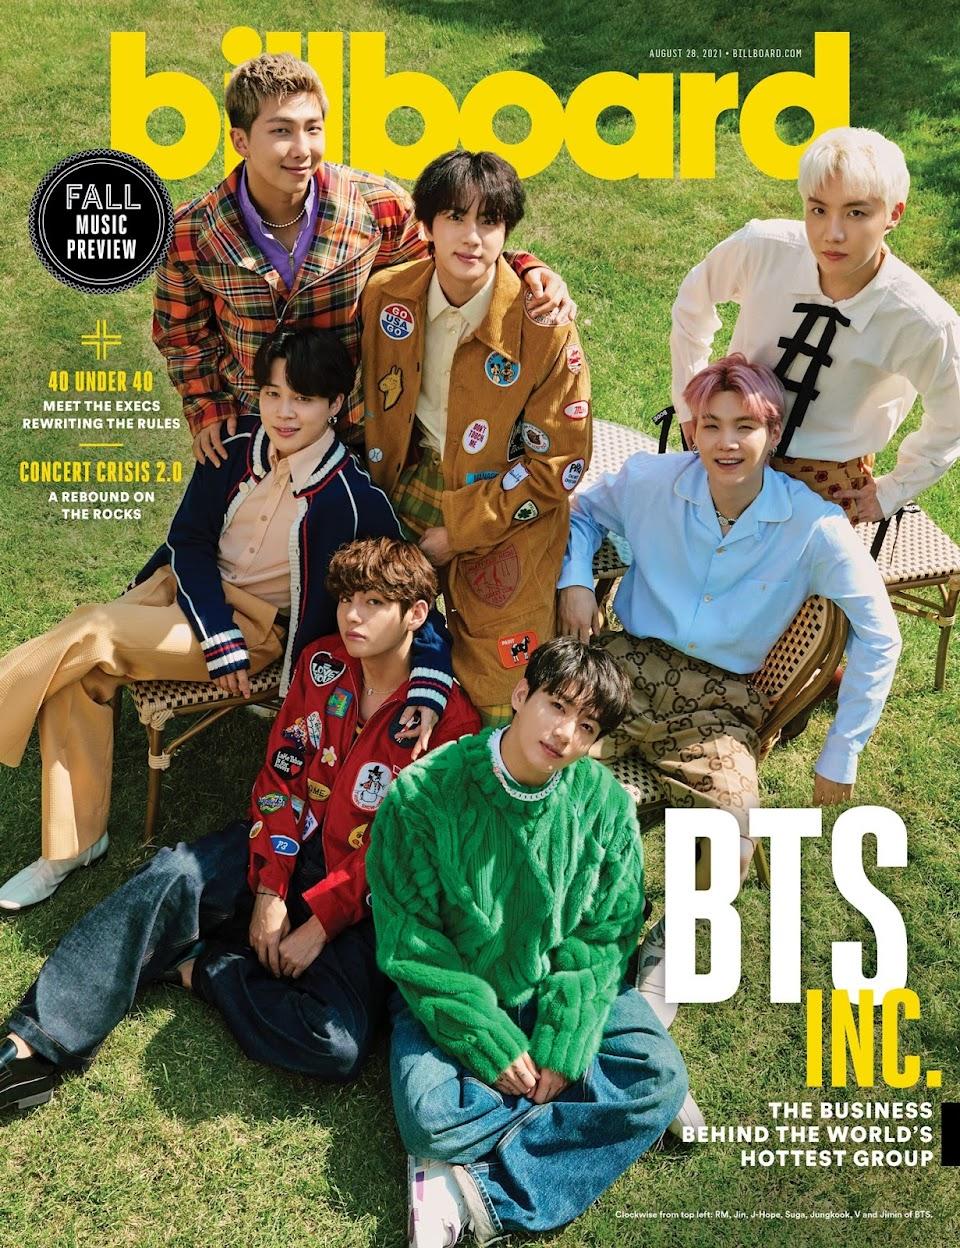 ARMY Tuntut Majalah Billboard Minta Maaf Ke BTS, Apa Sebabnya?